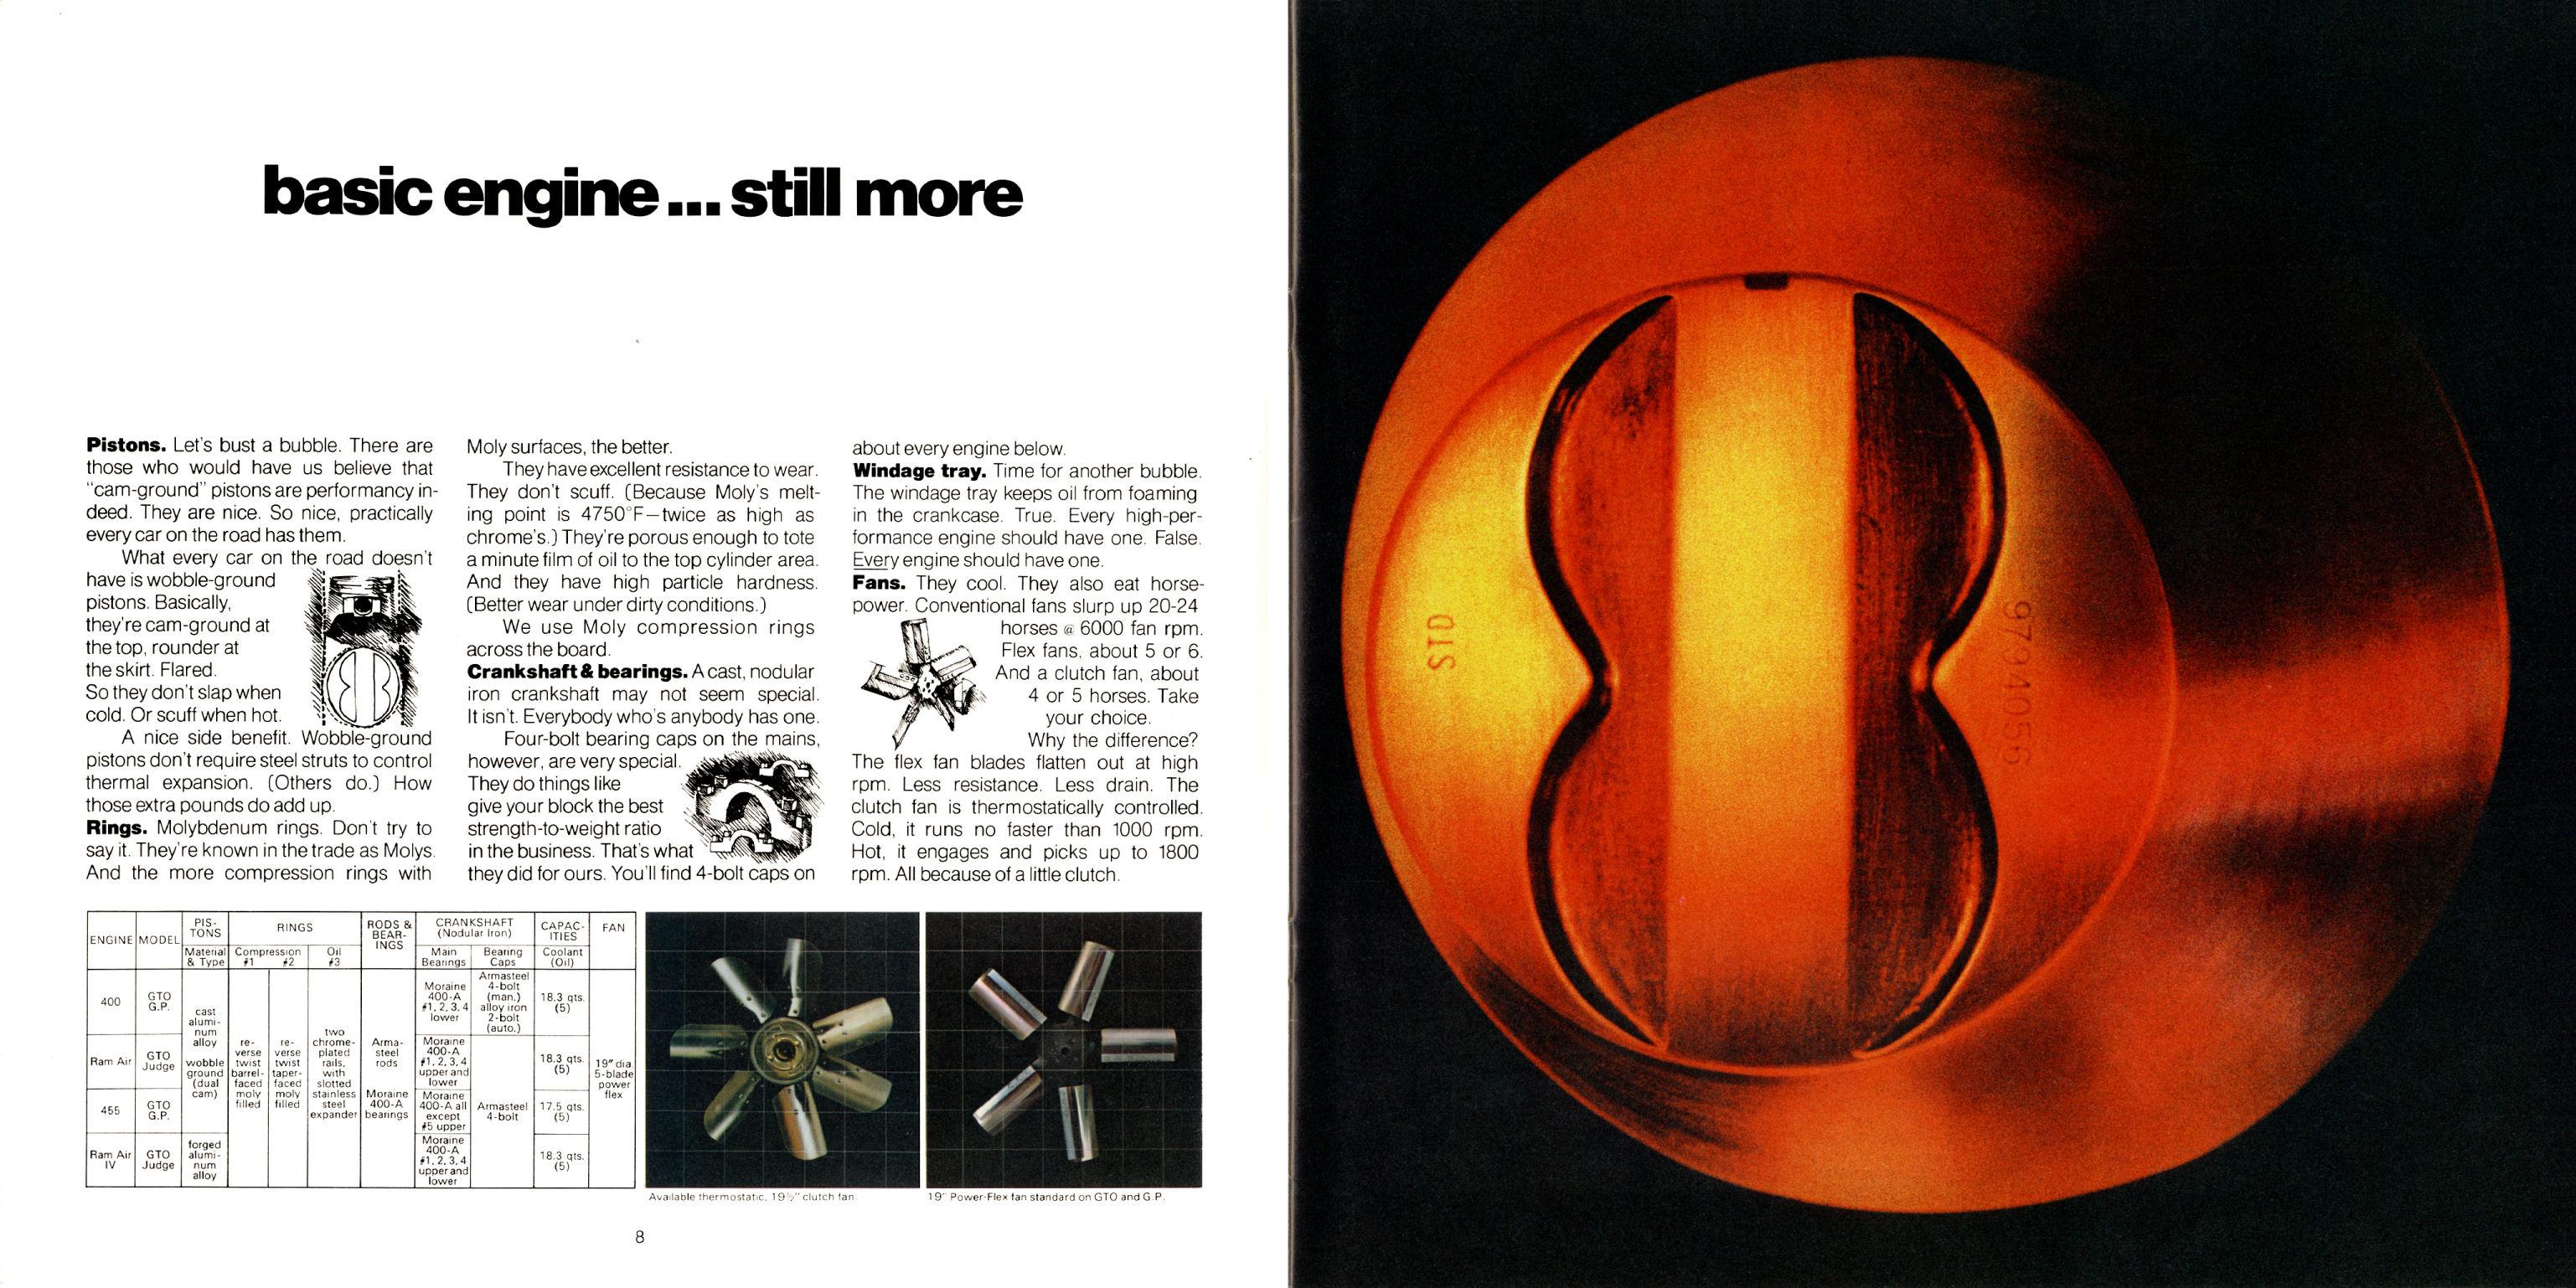 1970%20Pontiac%20Performance-08-09.jpg